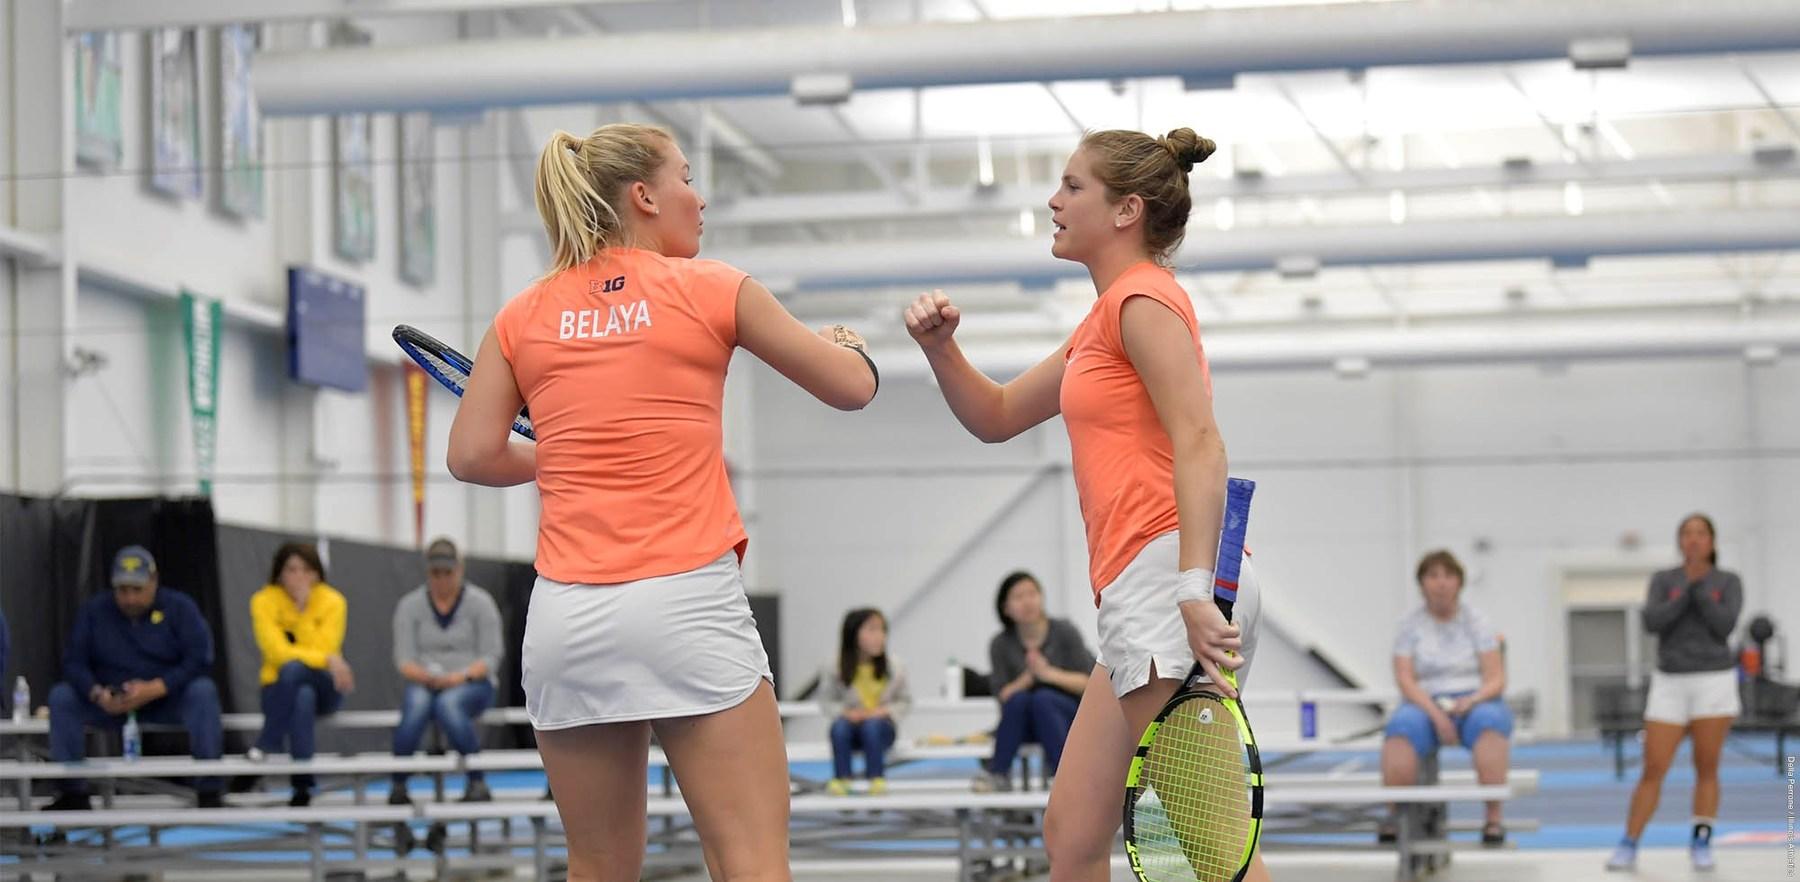 Illini women's tennis team players